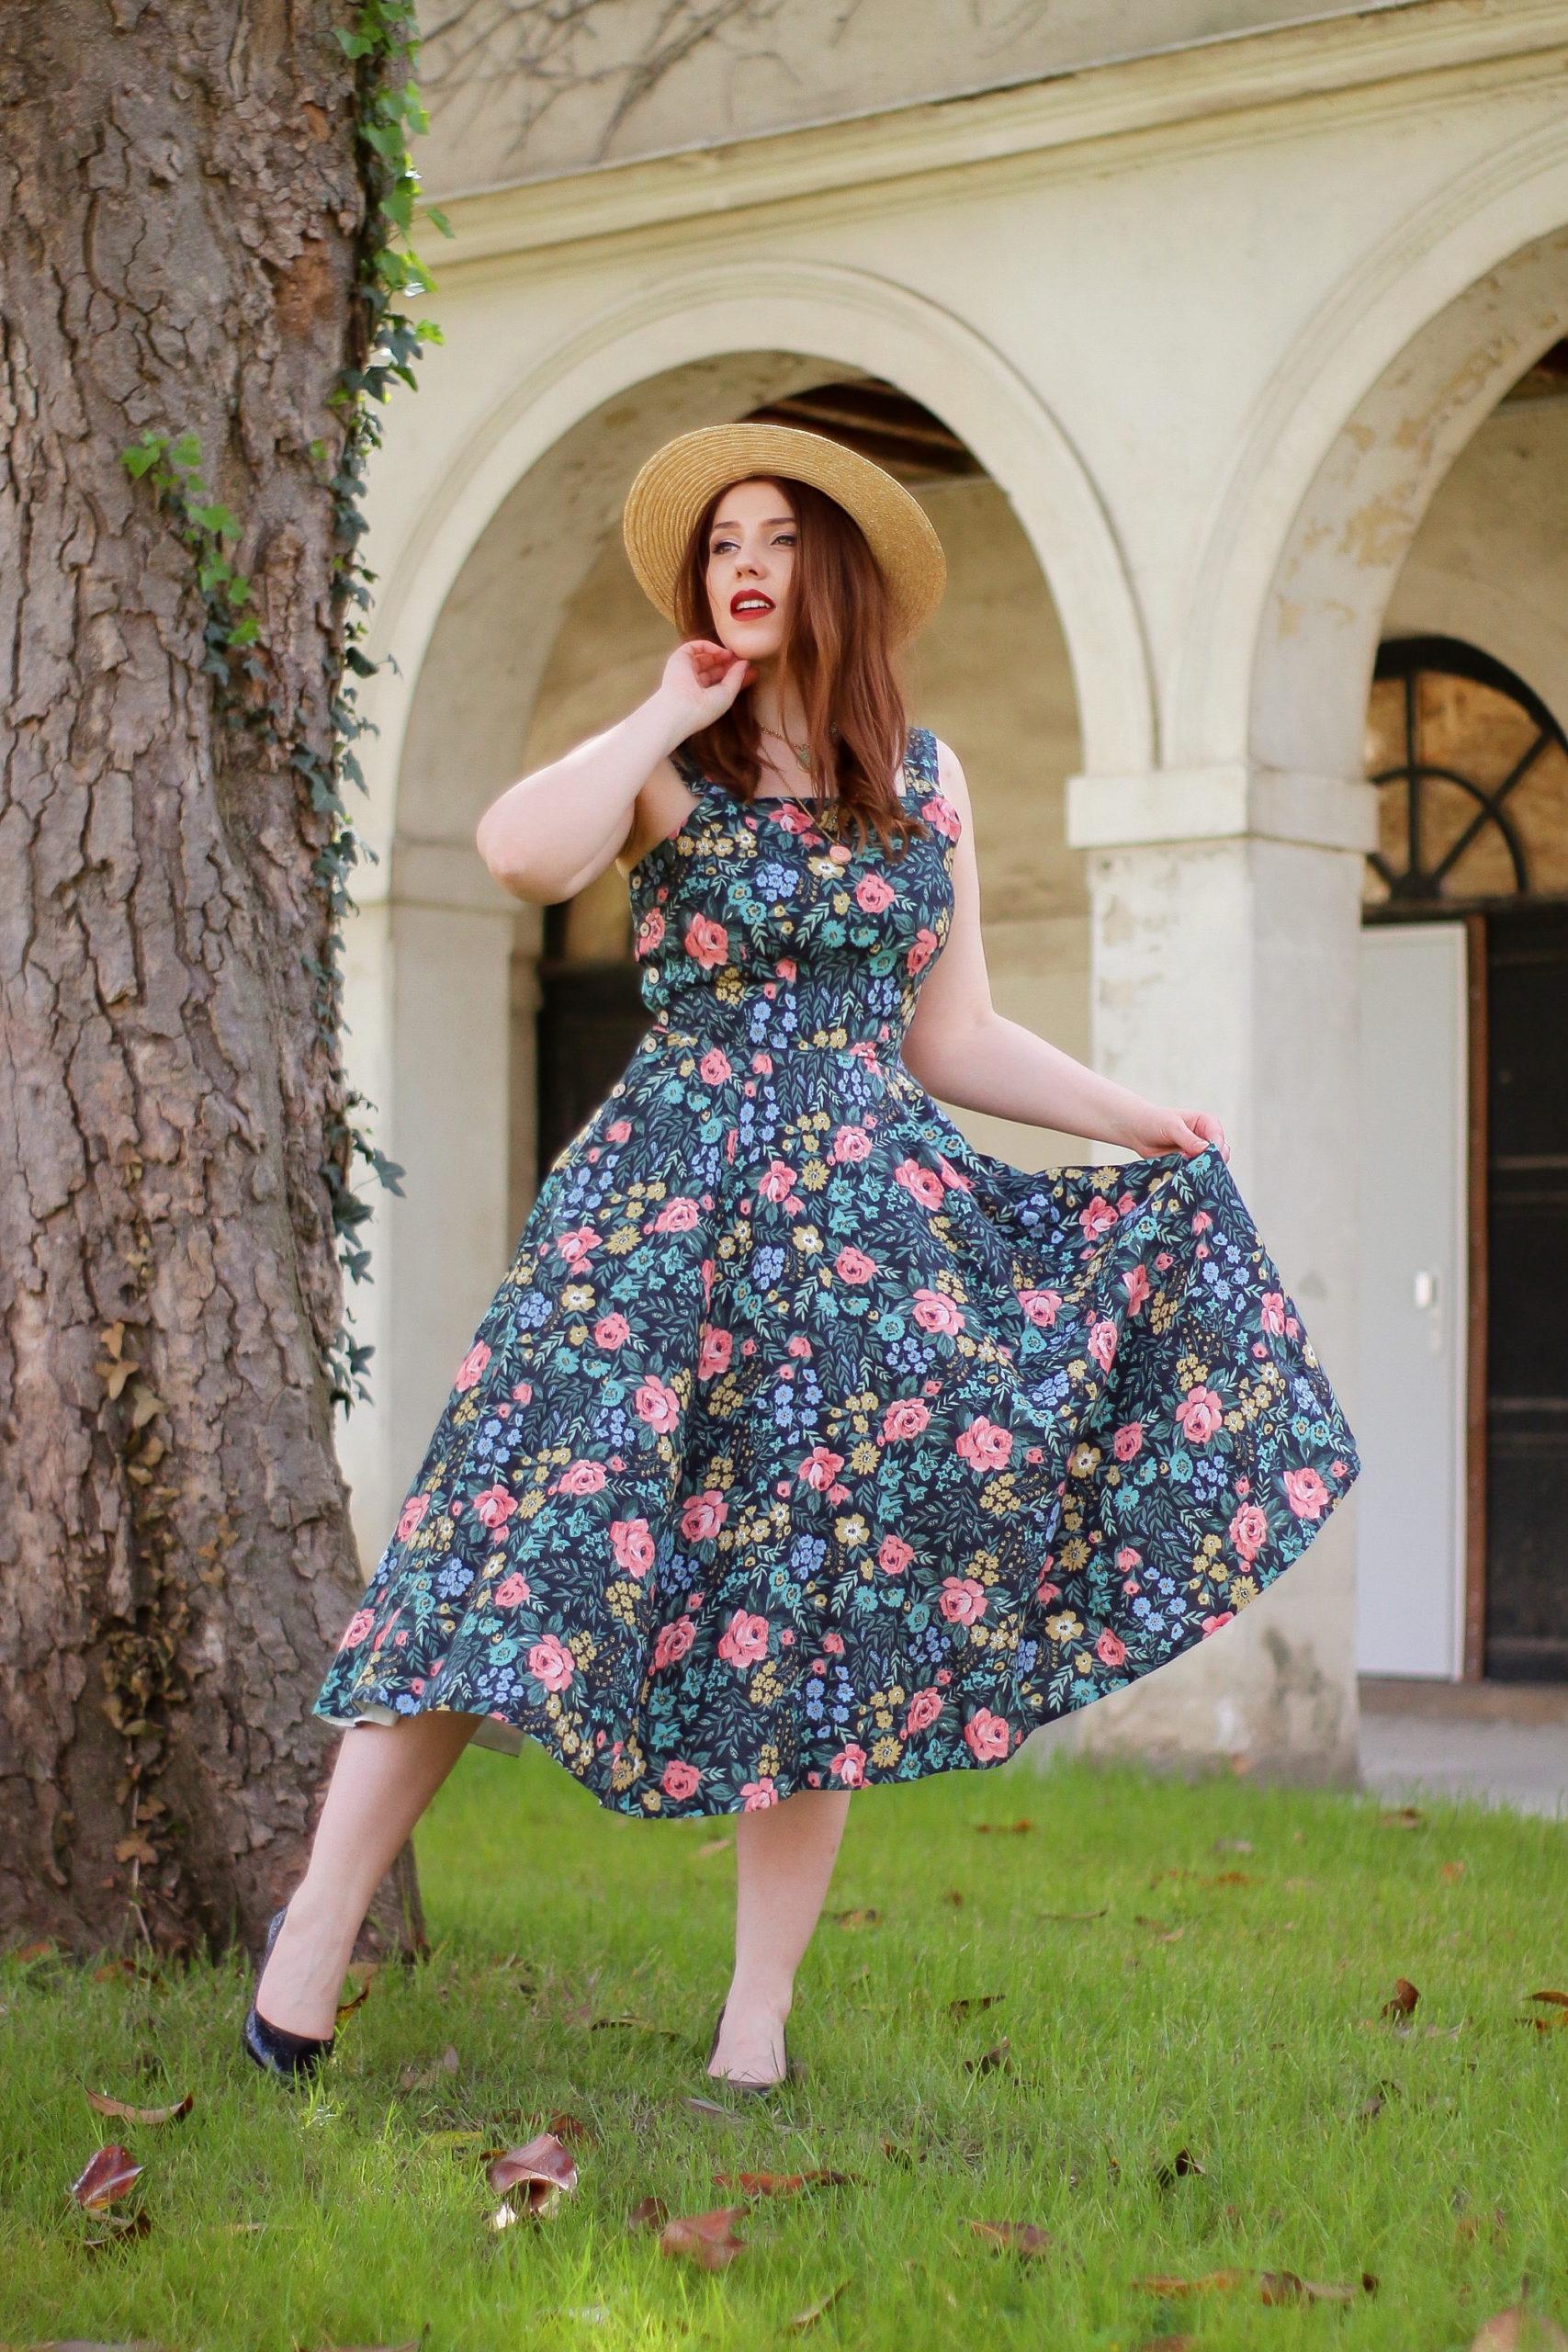 3 tenues de printemps estivale robe de printemps robe rétro vintage robe Sondeflor robe en lin été